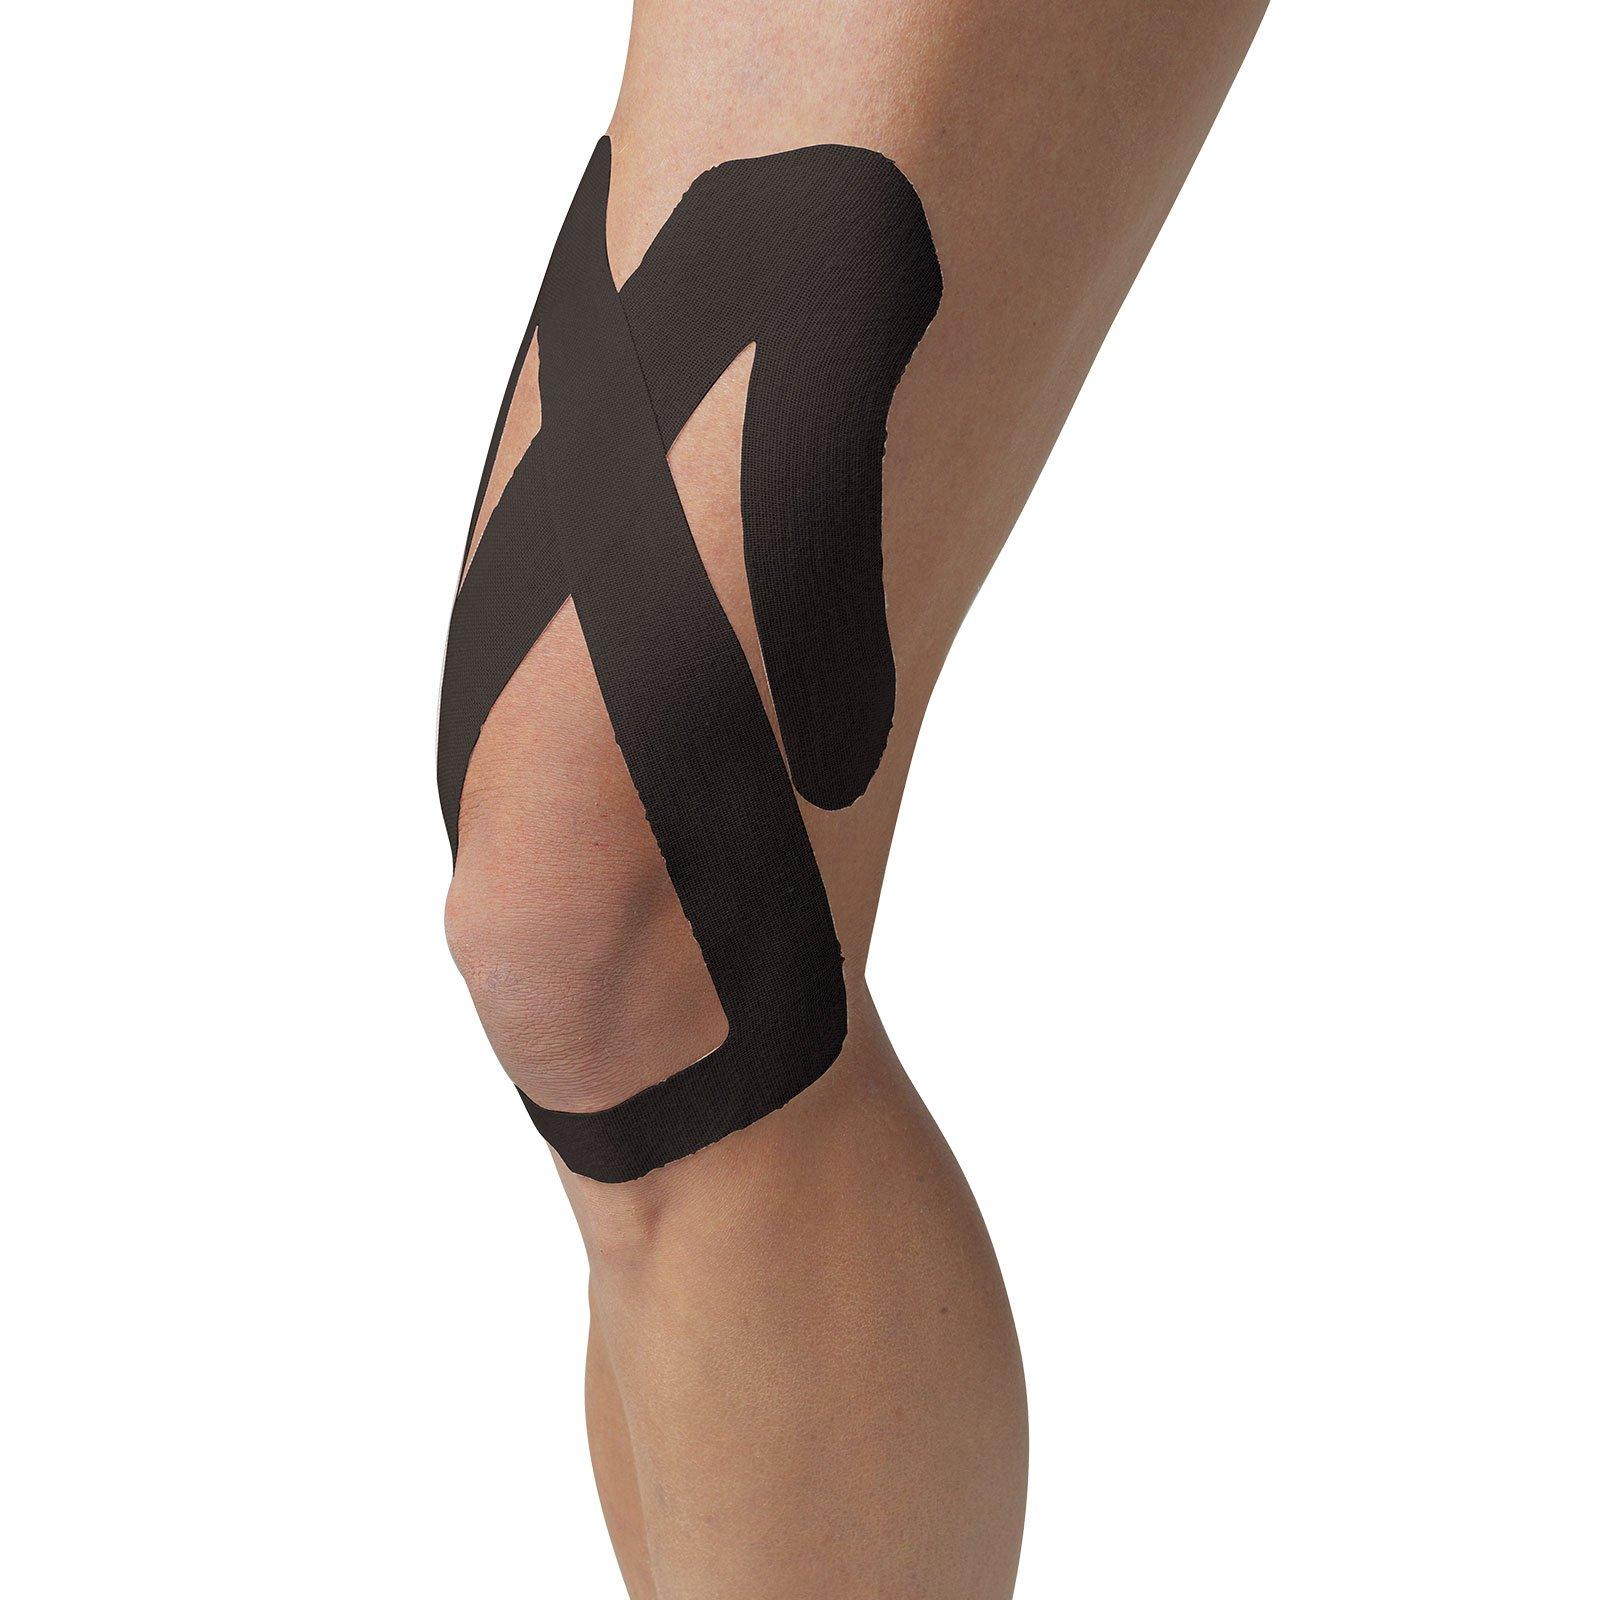 SpiderTech Upper Knee Kinesiology Tape - Bulk Package (10) (Black) by Spider Tech